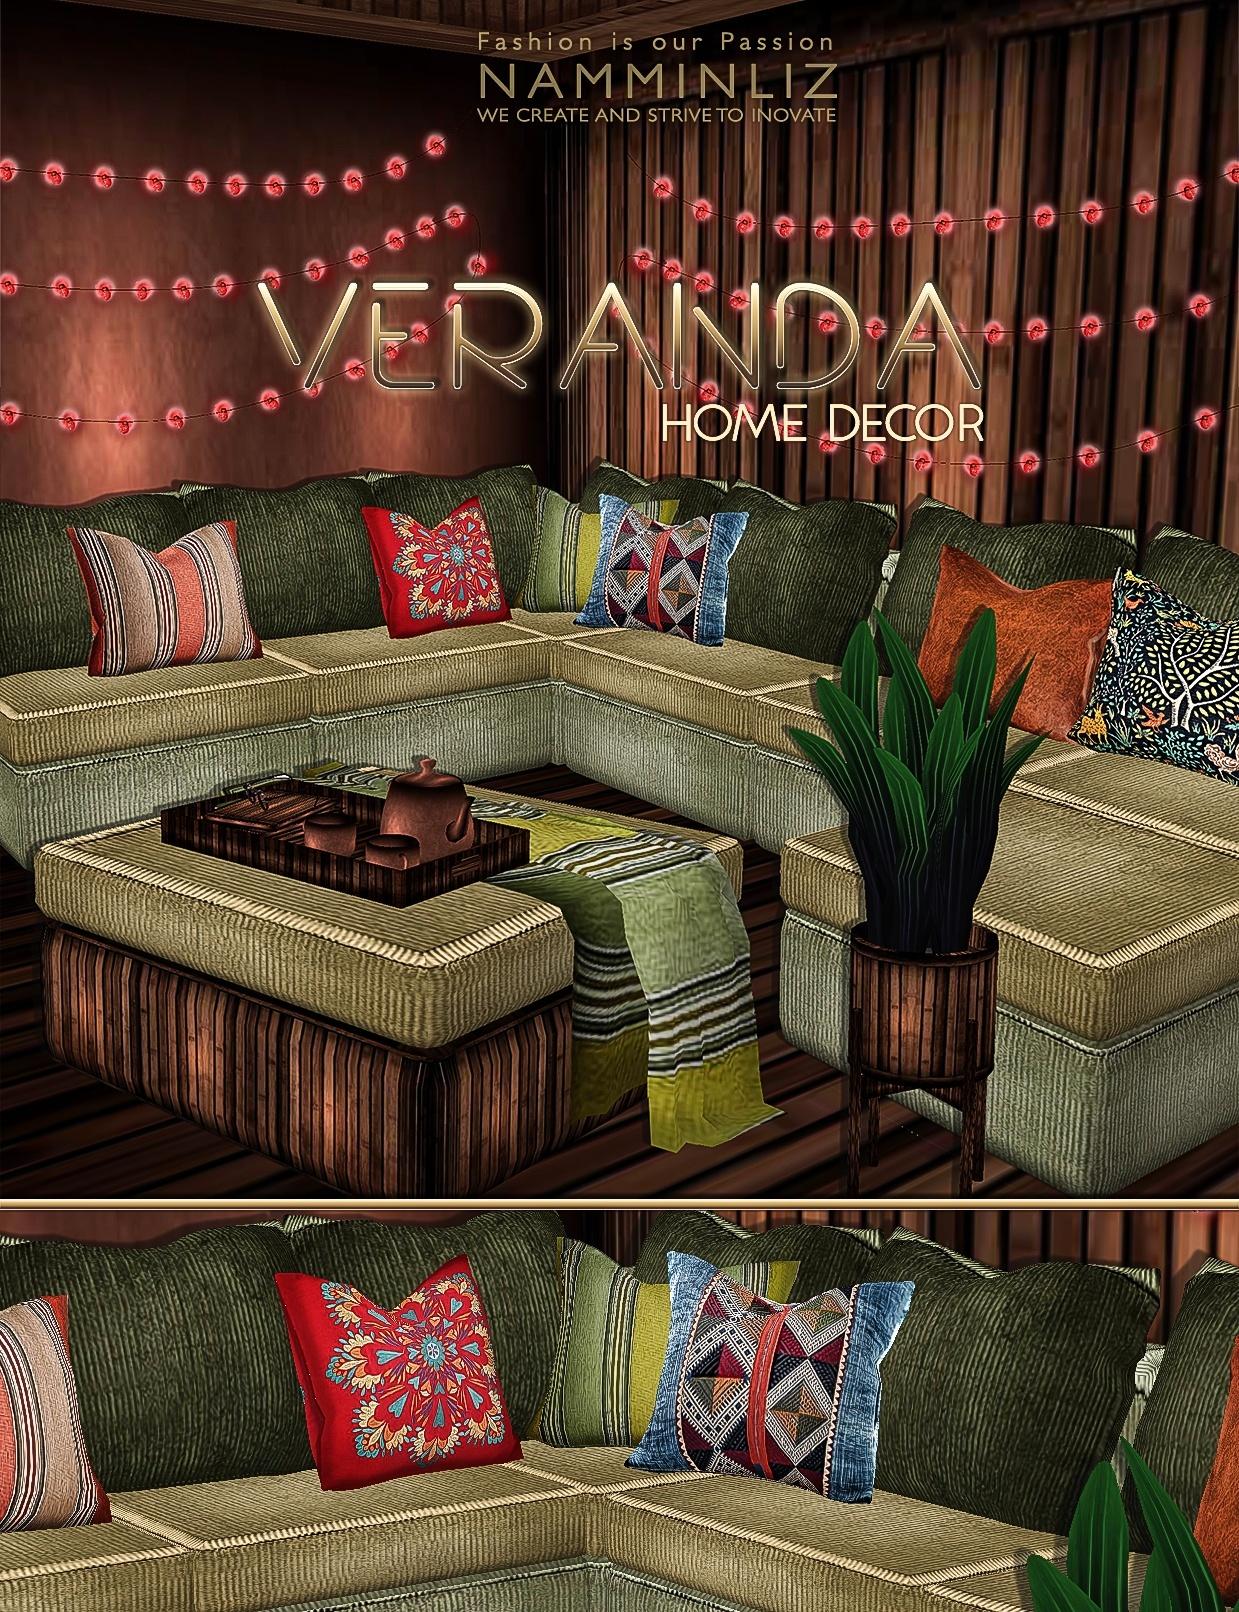 VERANDA Home decor imvu 30 Textures PNG & 15 *.CHKN